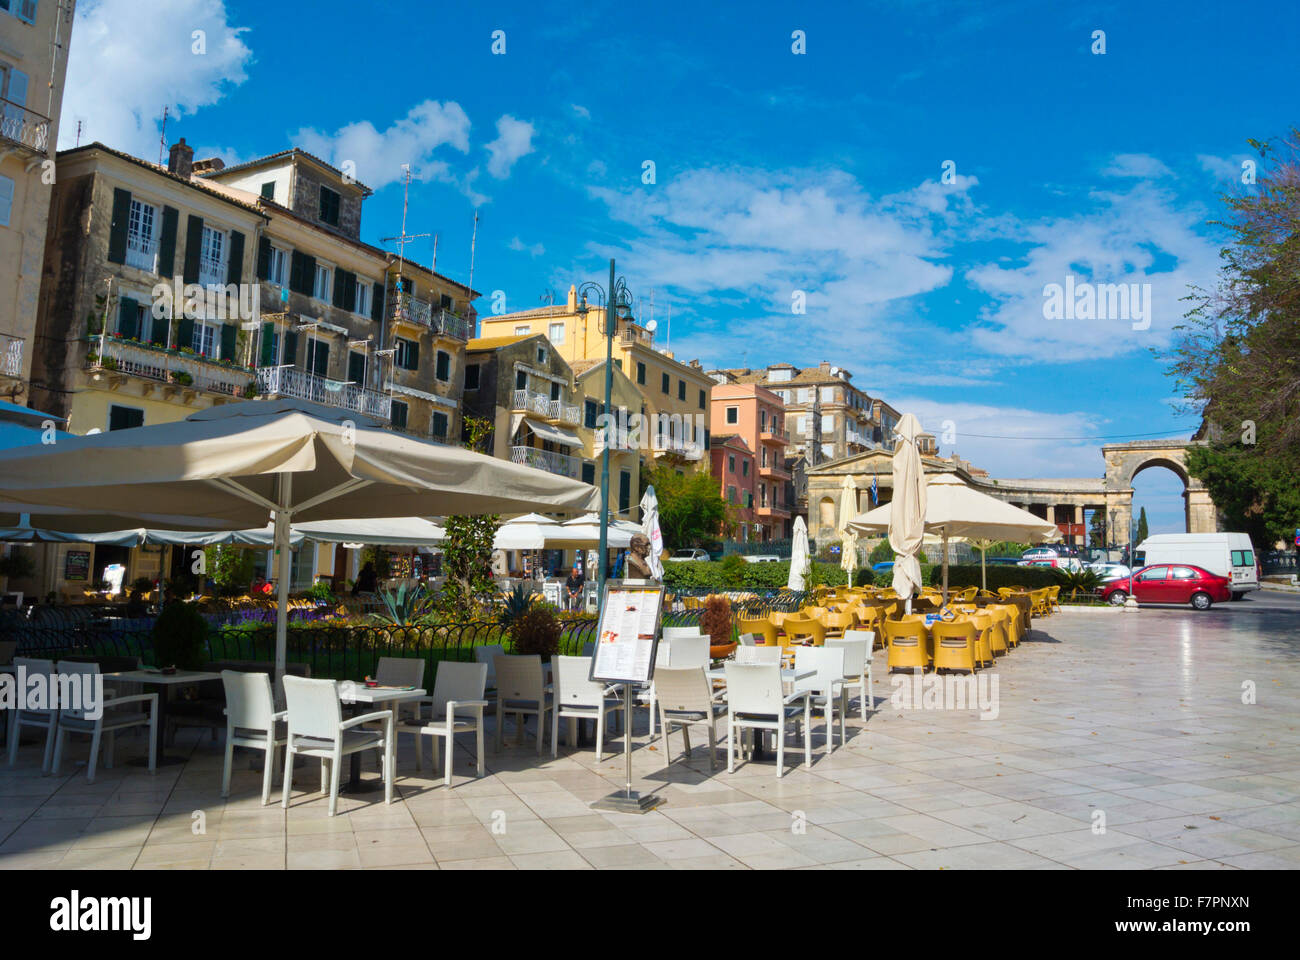 Restaurant terraces, Kapodistriou street, Old town, Corfu, Ionian islands, Greece - Stock Image